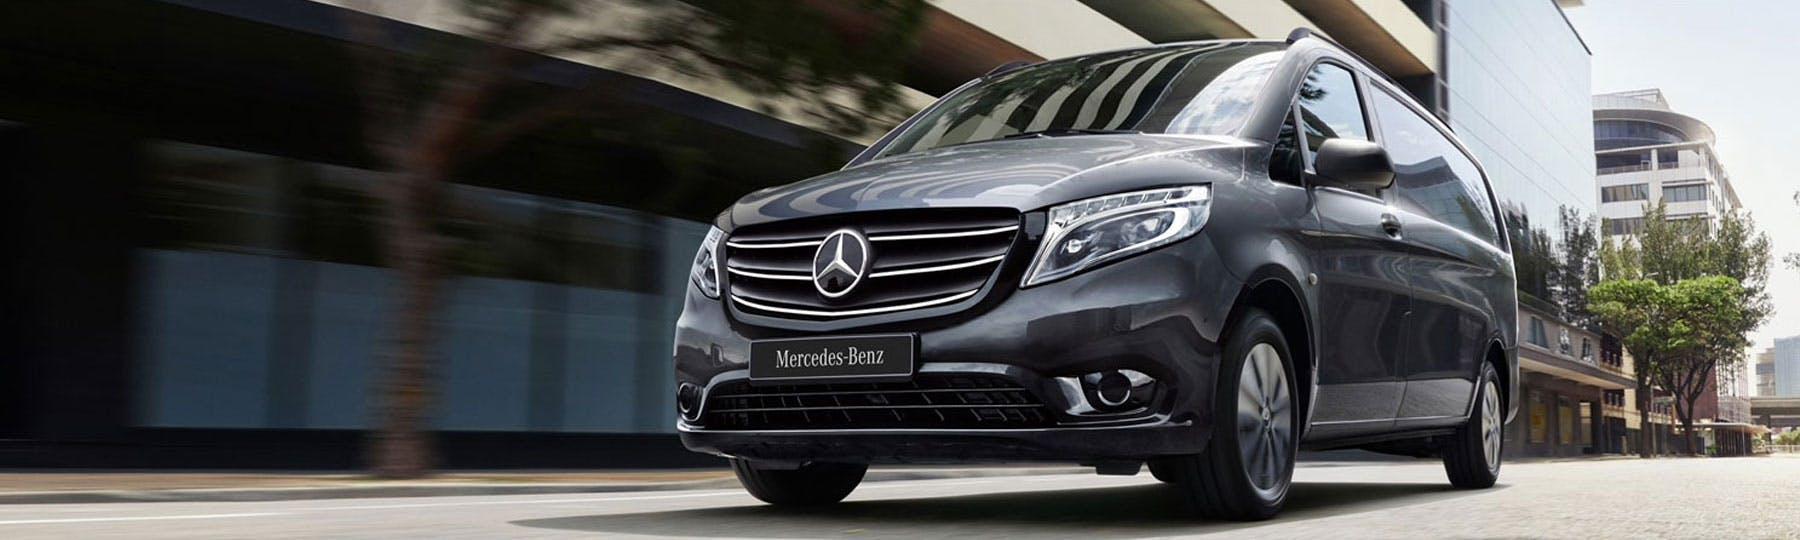 New Mercedes-Benz Vito